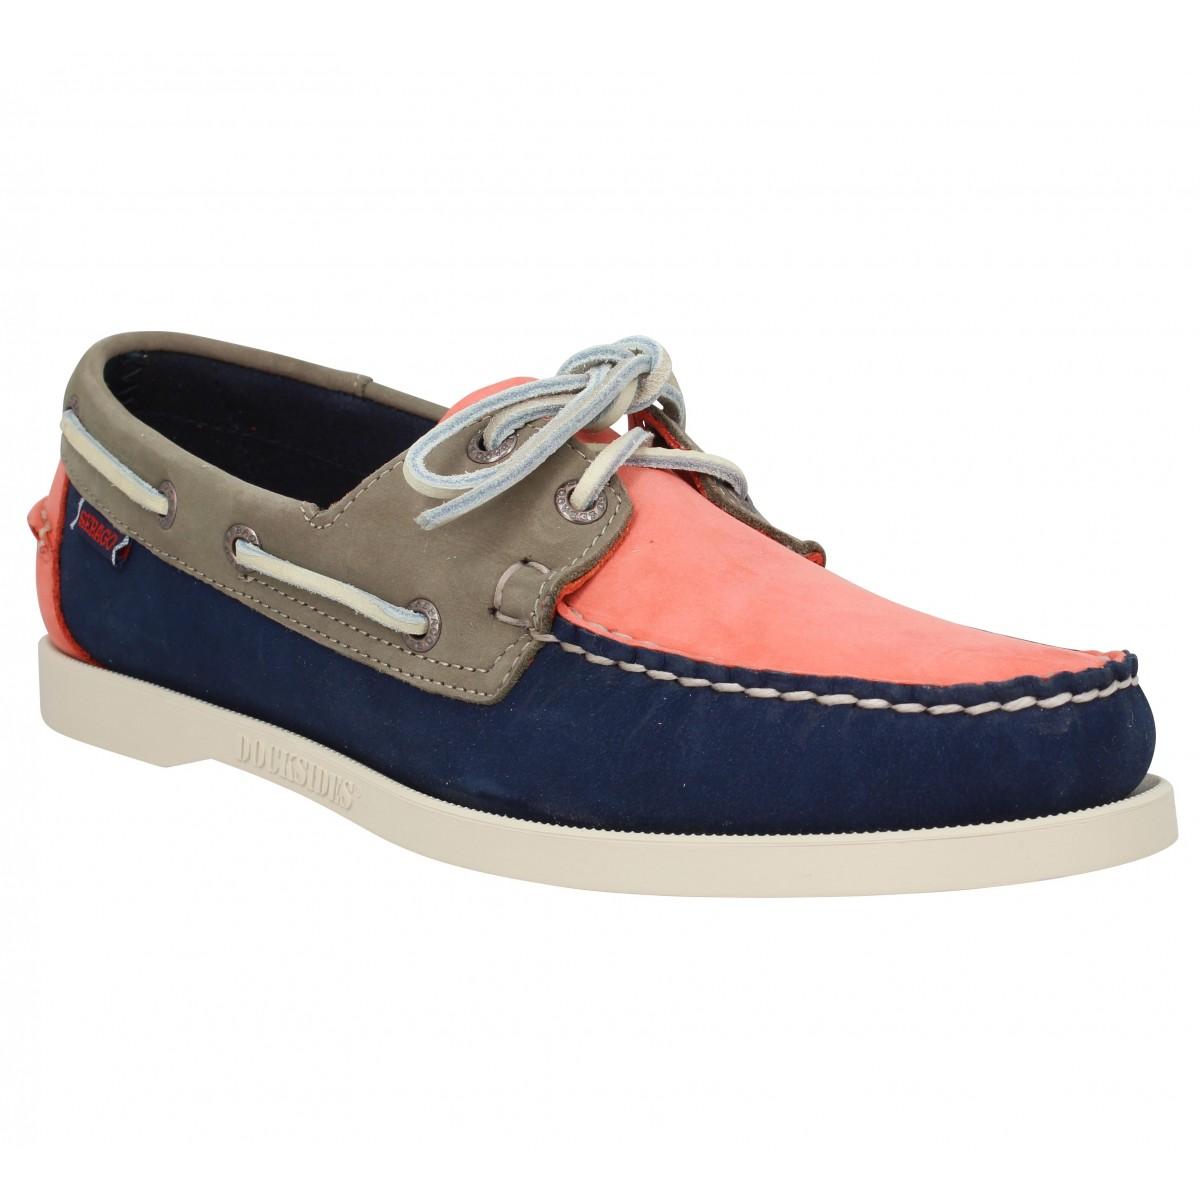 SEBAGO Chaussures Bateaux SEBAGO Docksides Velours Homme